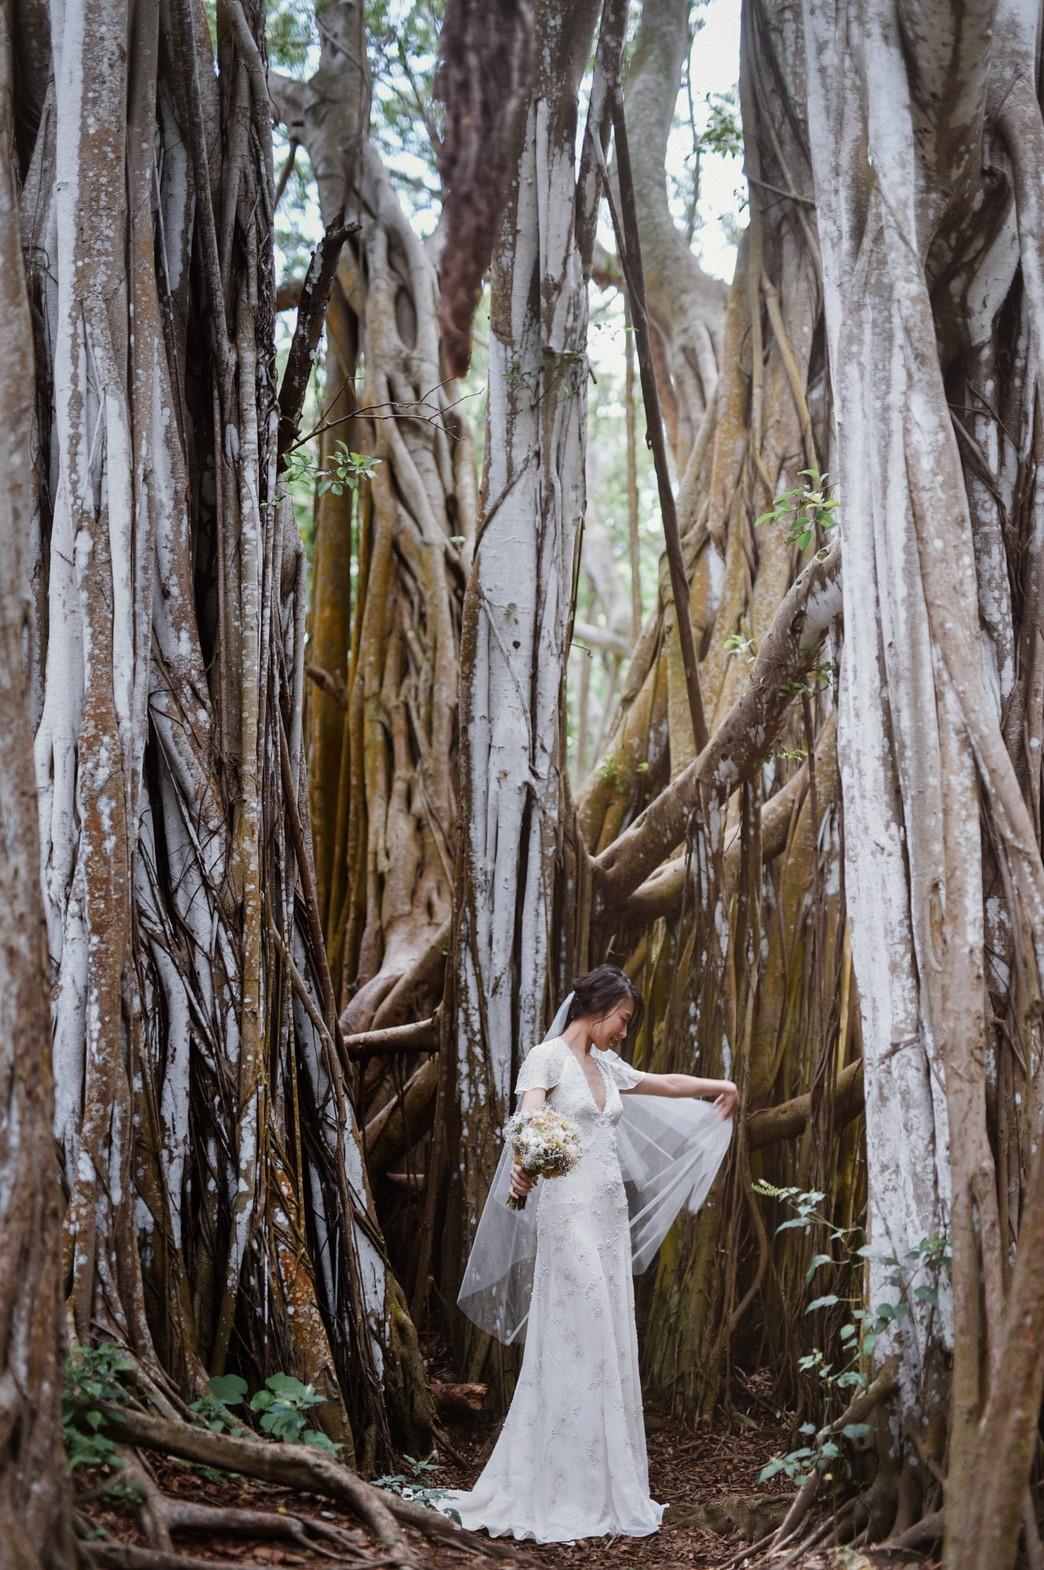 A THINGS WHITE_JENNY PACKHAM_OCTAVIA10